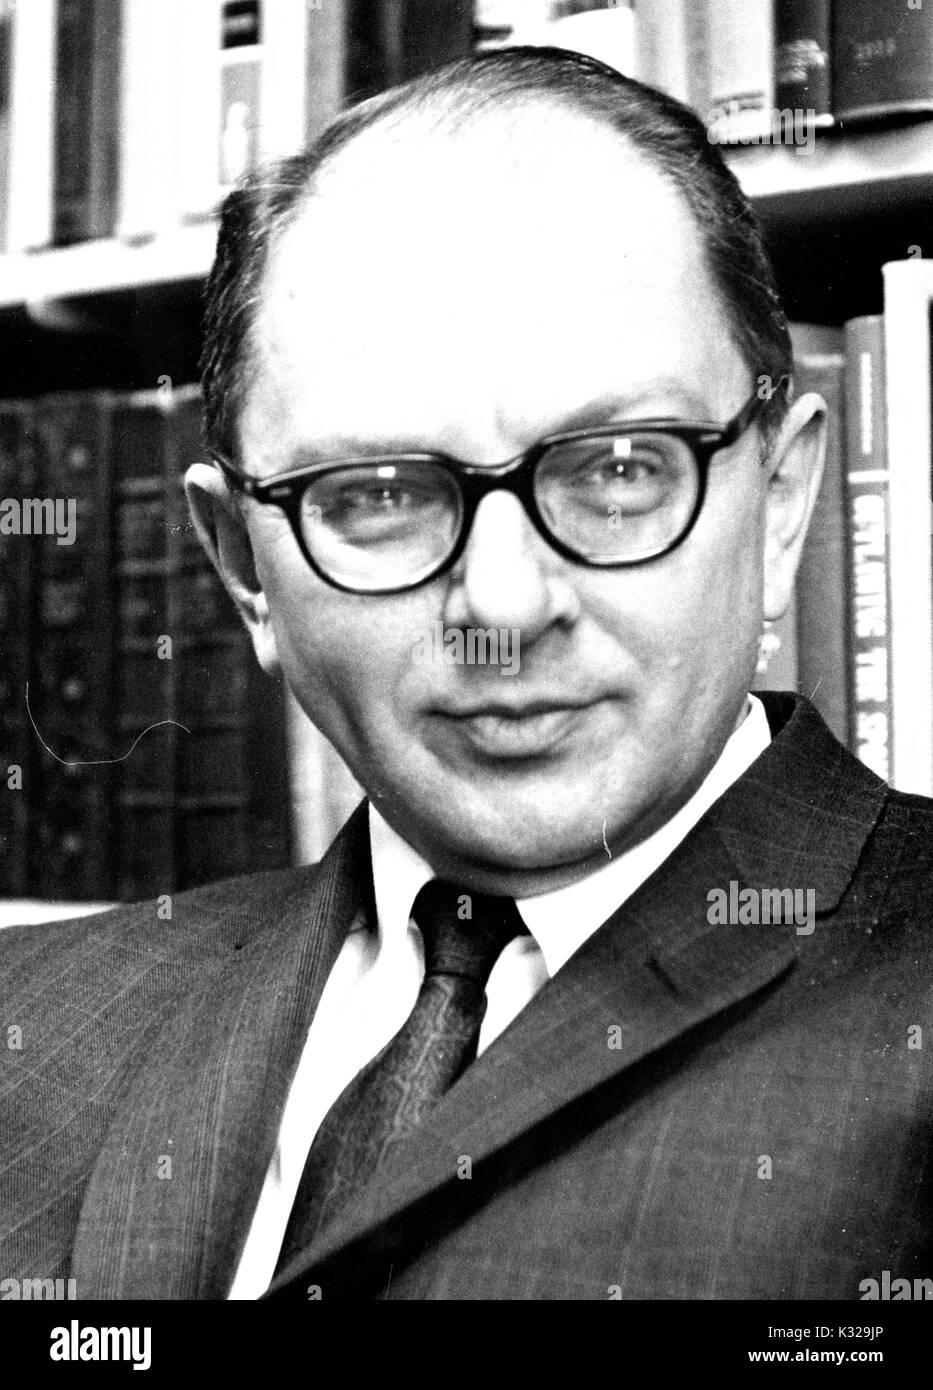 Portrait photograph of American historian and biographer David Herbert Donald sitting in front of bookshelves, 1962. - Stock Image